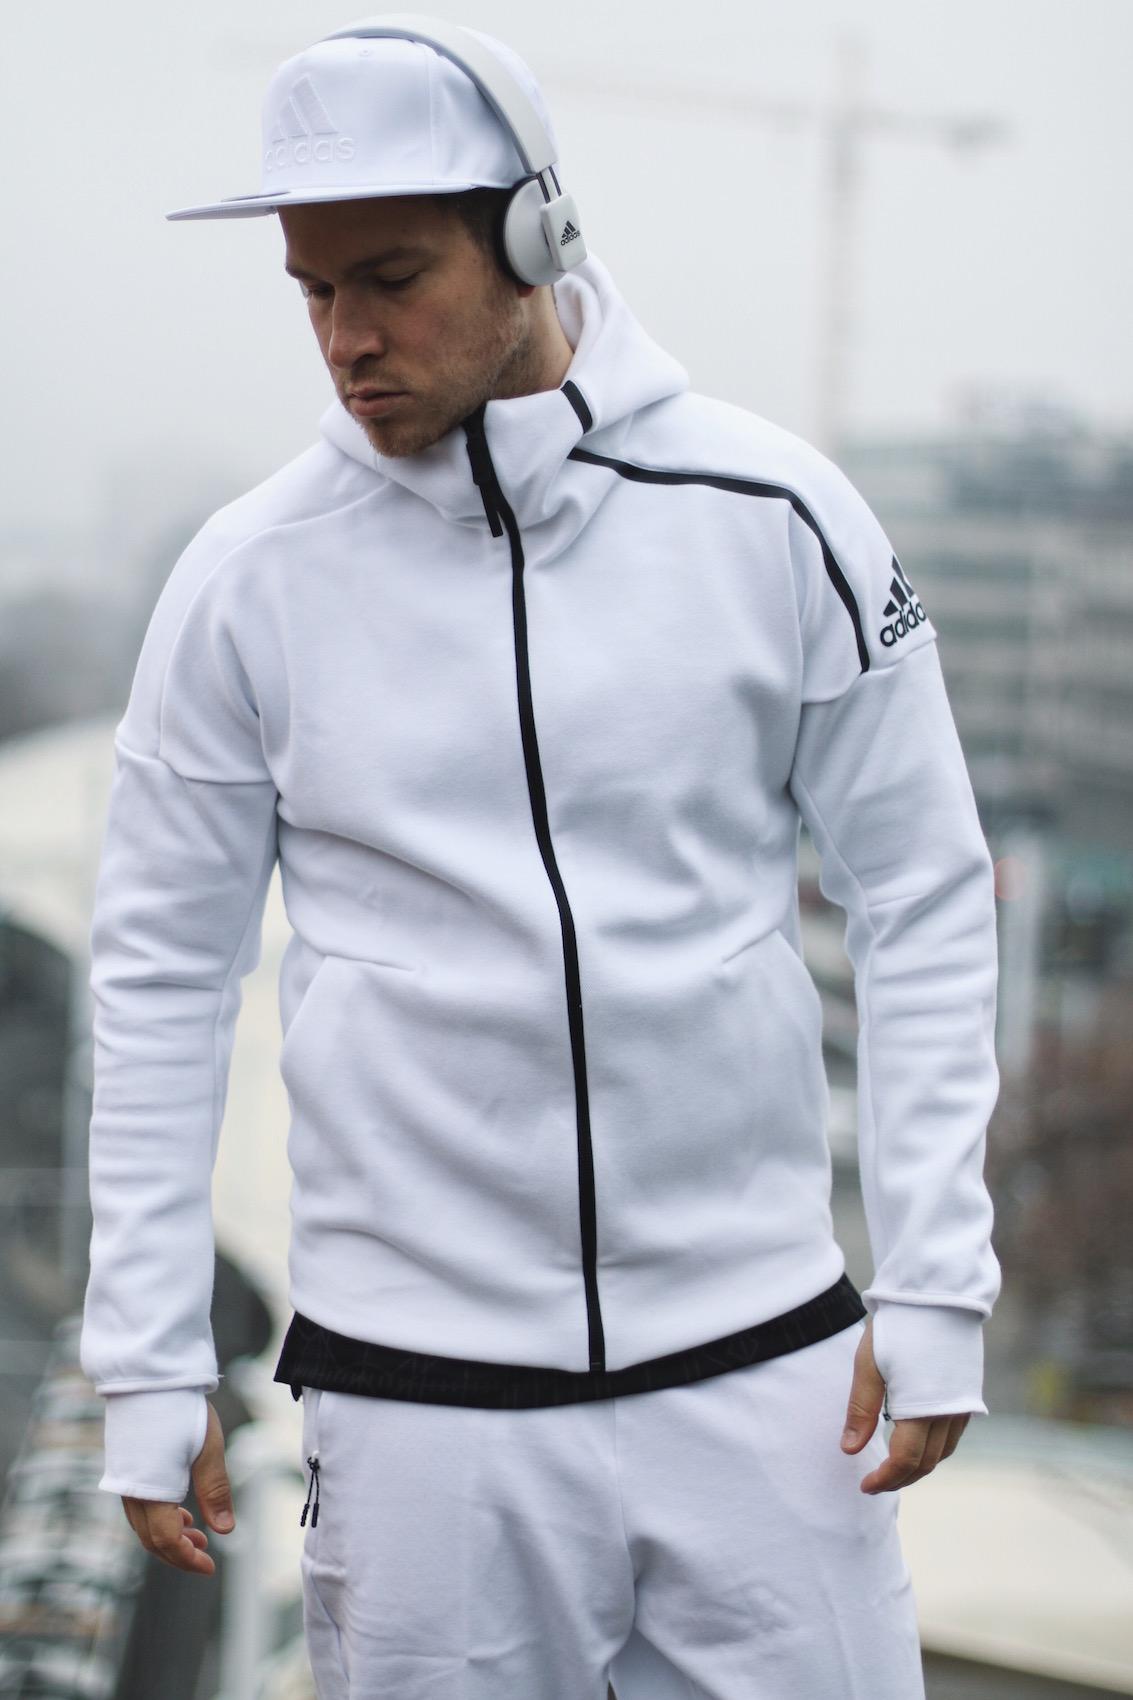 Adidas ZNE Hoodie_Adidas Austria_Meanwhile in Awesometown_Wiener Männerblog Modeblog Männermode Lifestyleblog3